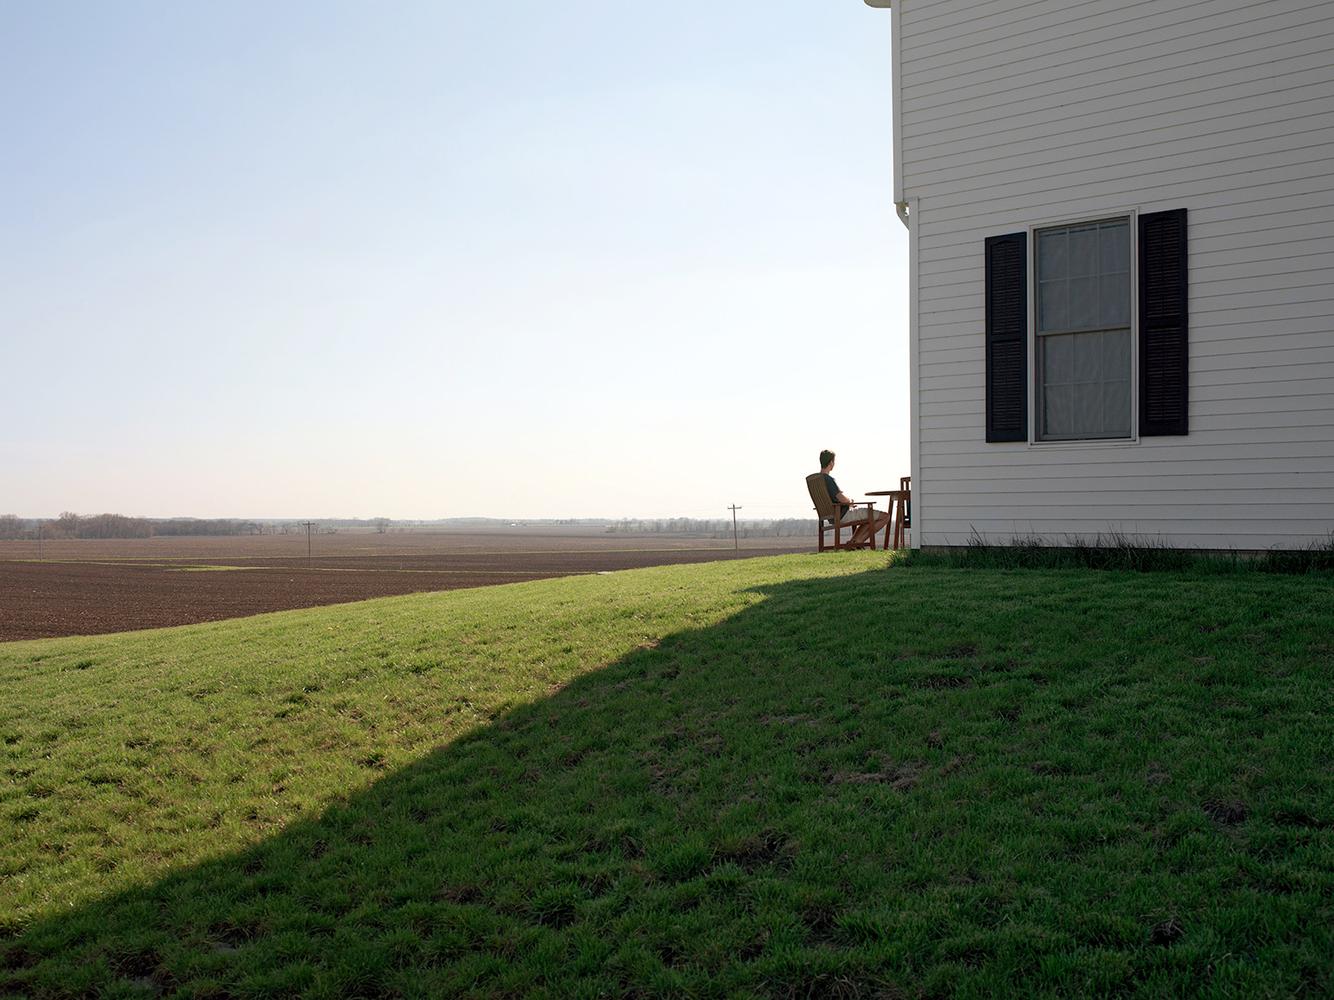 New House Flanking Farmland, near Burlington, IL 2007